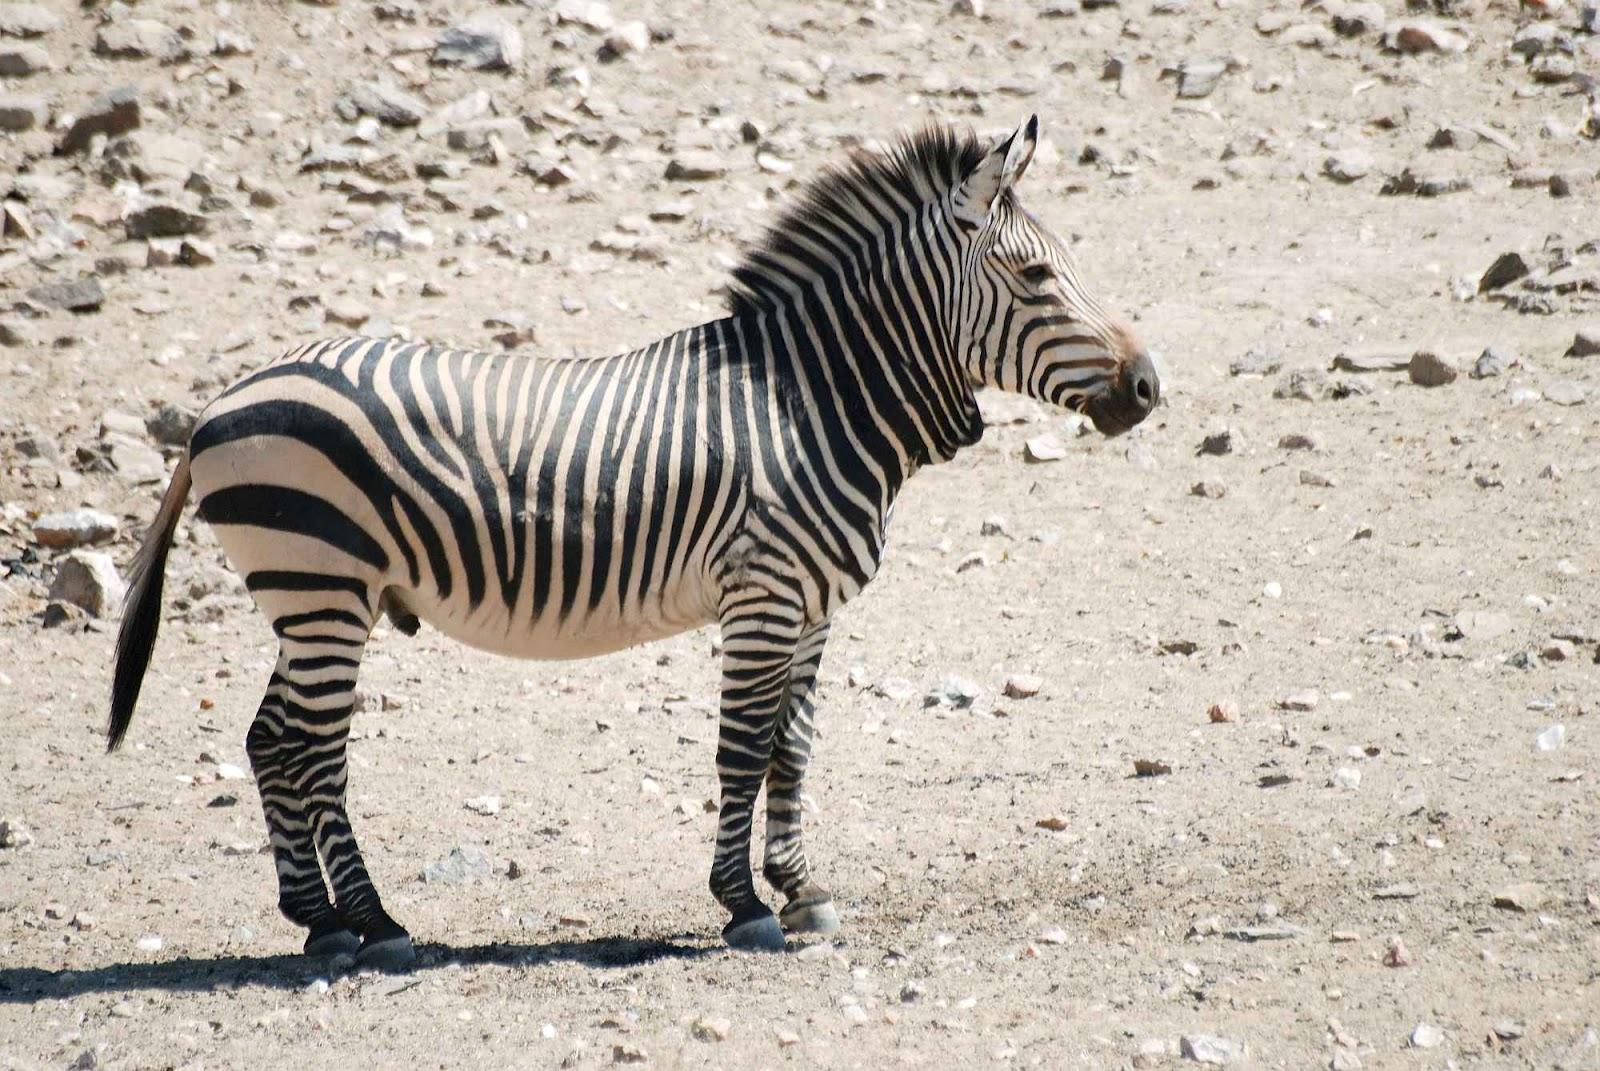 Geoff S Blogs Zebras